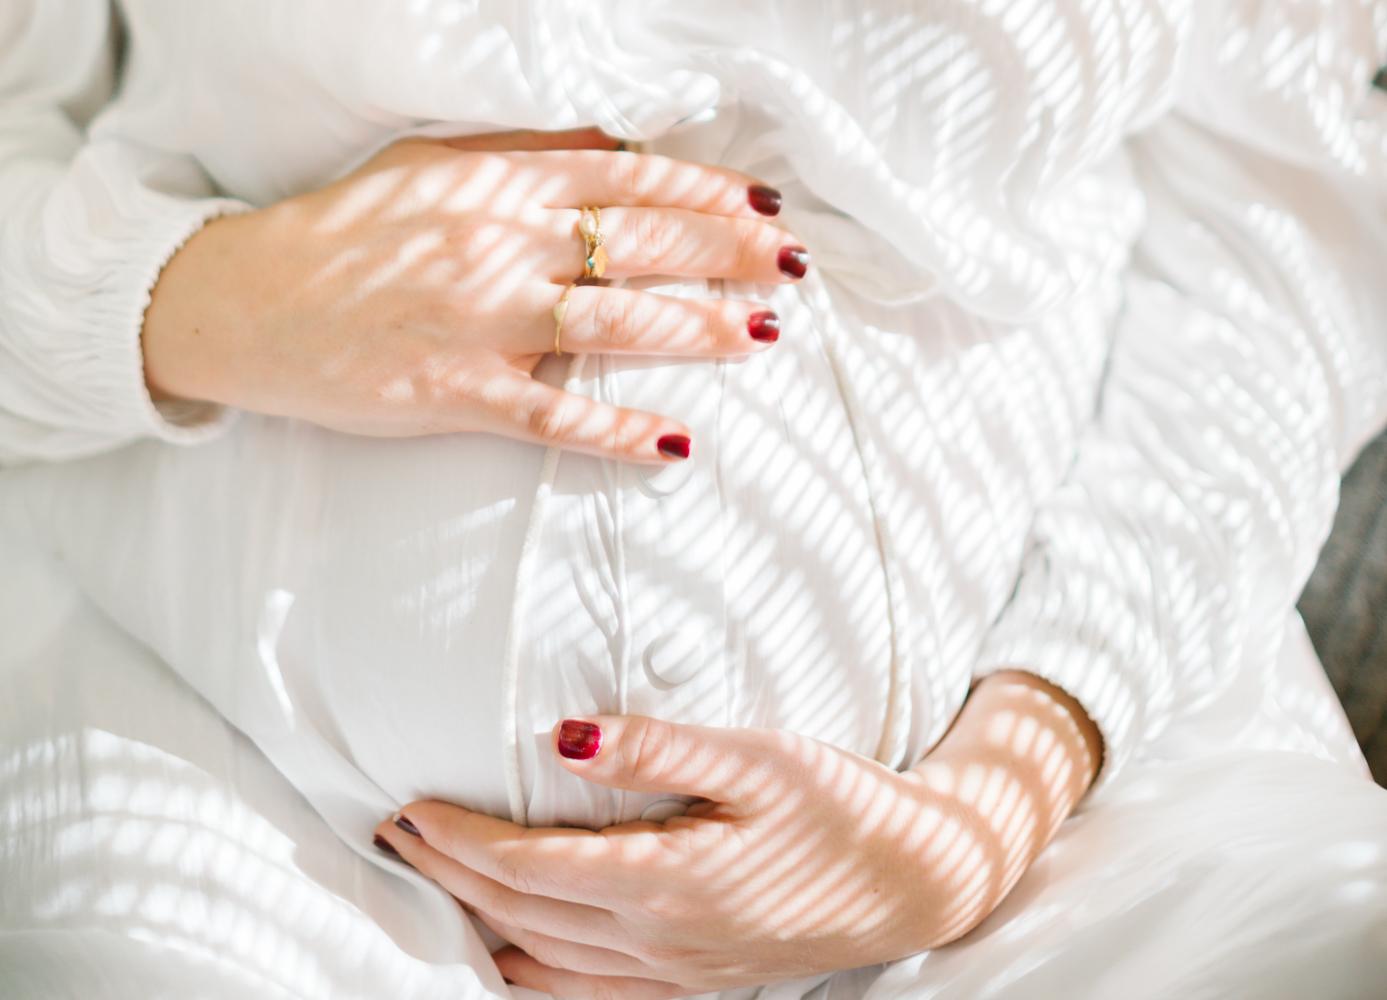 fineart_maternity_photography-6.jpg